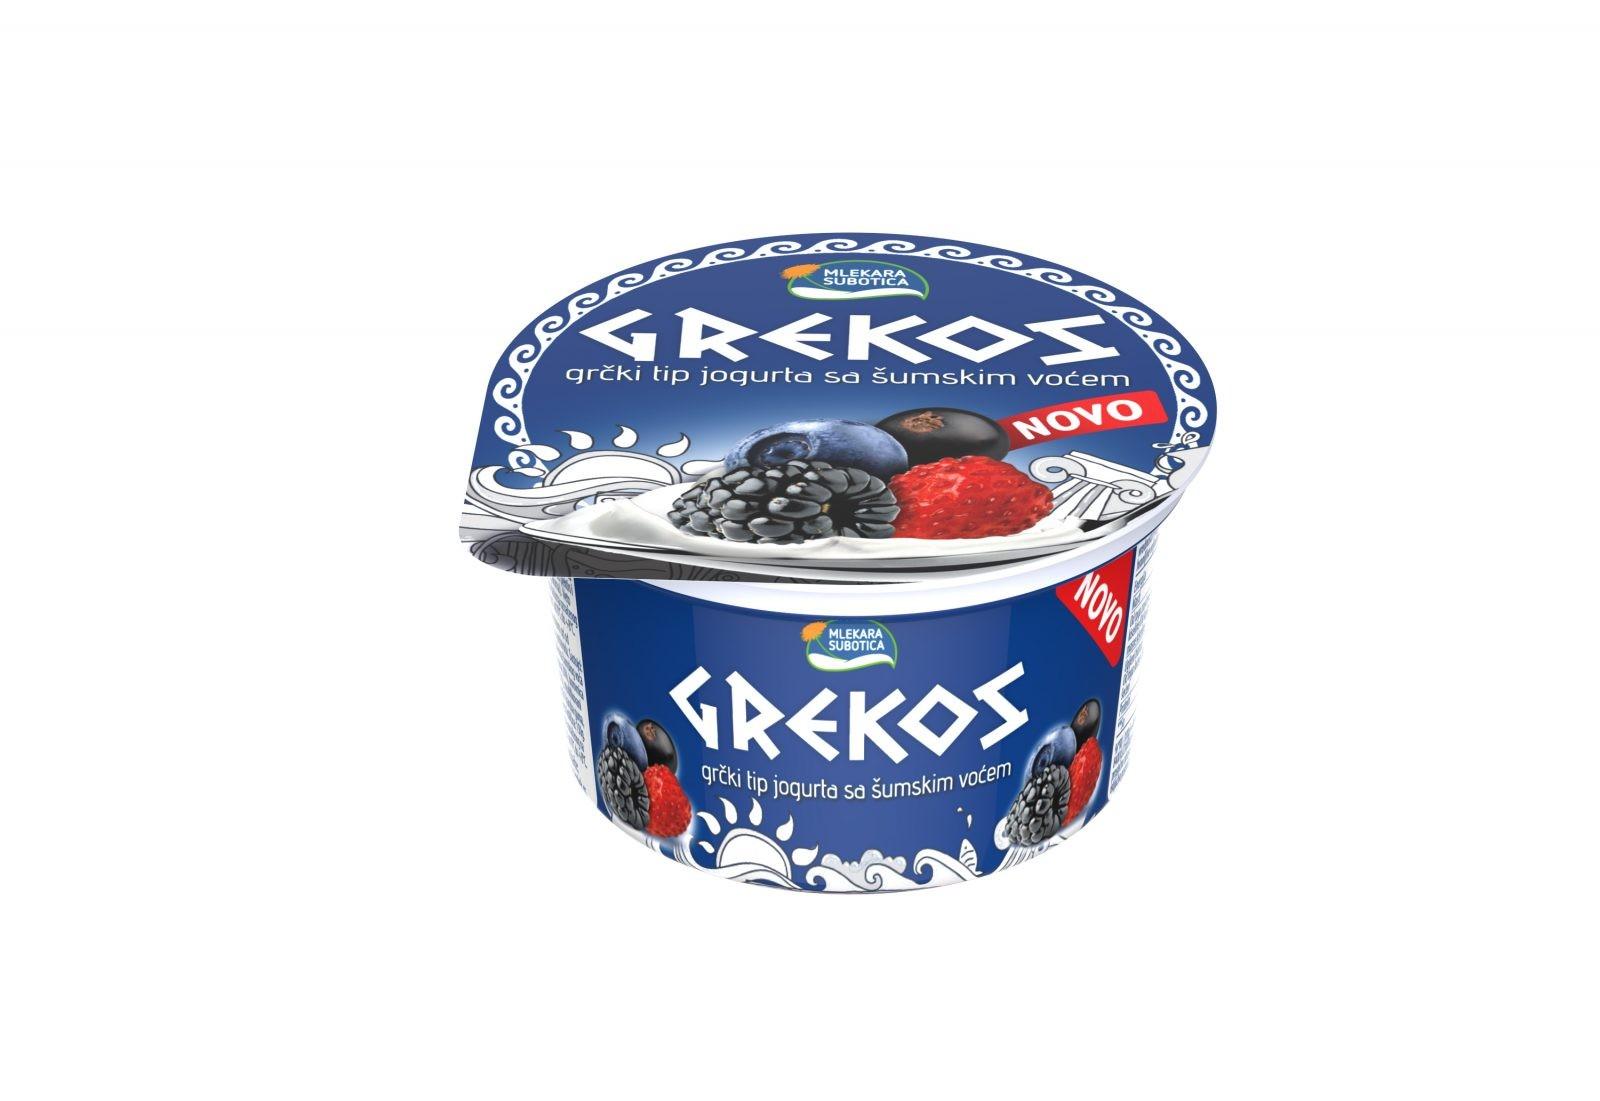 grekos jogurti, novi ukusi,visnja i sumsko voce,press srbija